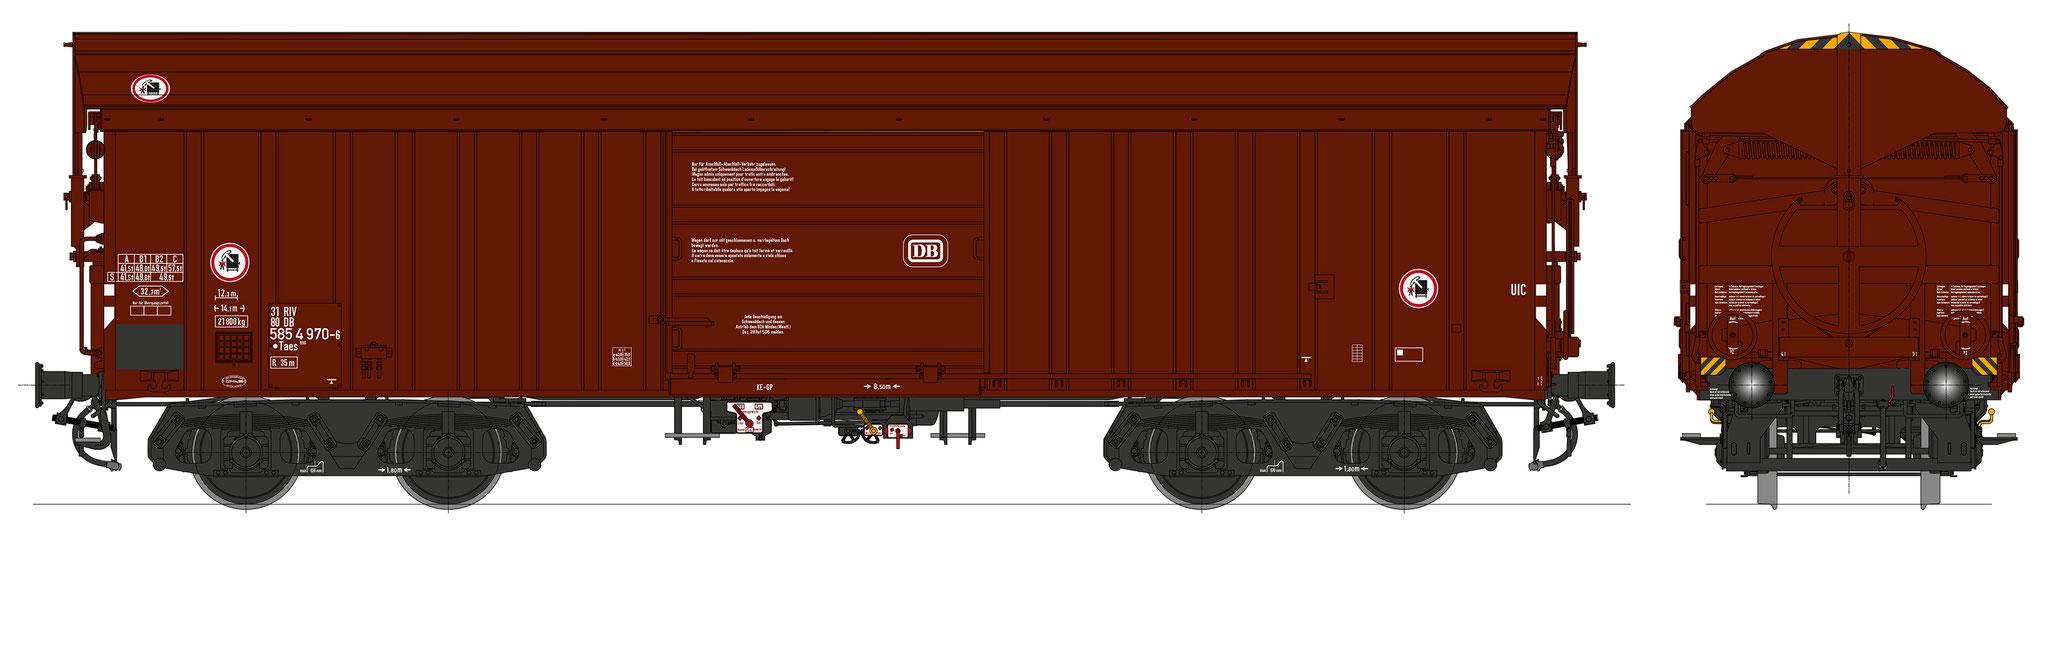 Bestell-Nr. 16064, Ep. 4b, Fahrgestell schwarz